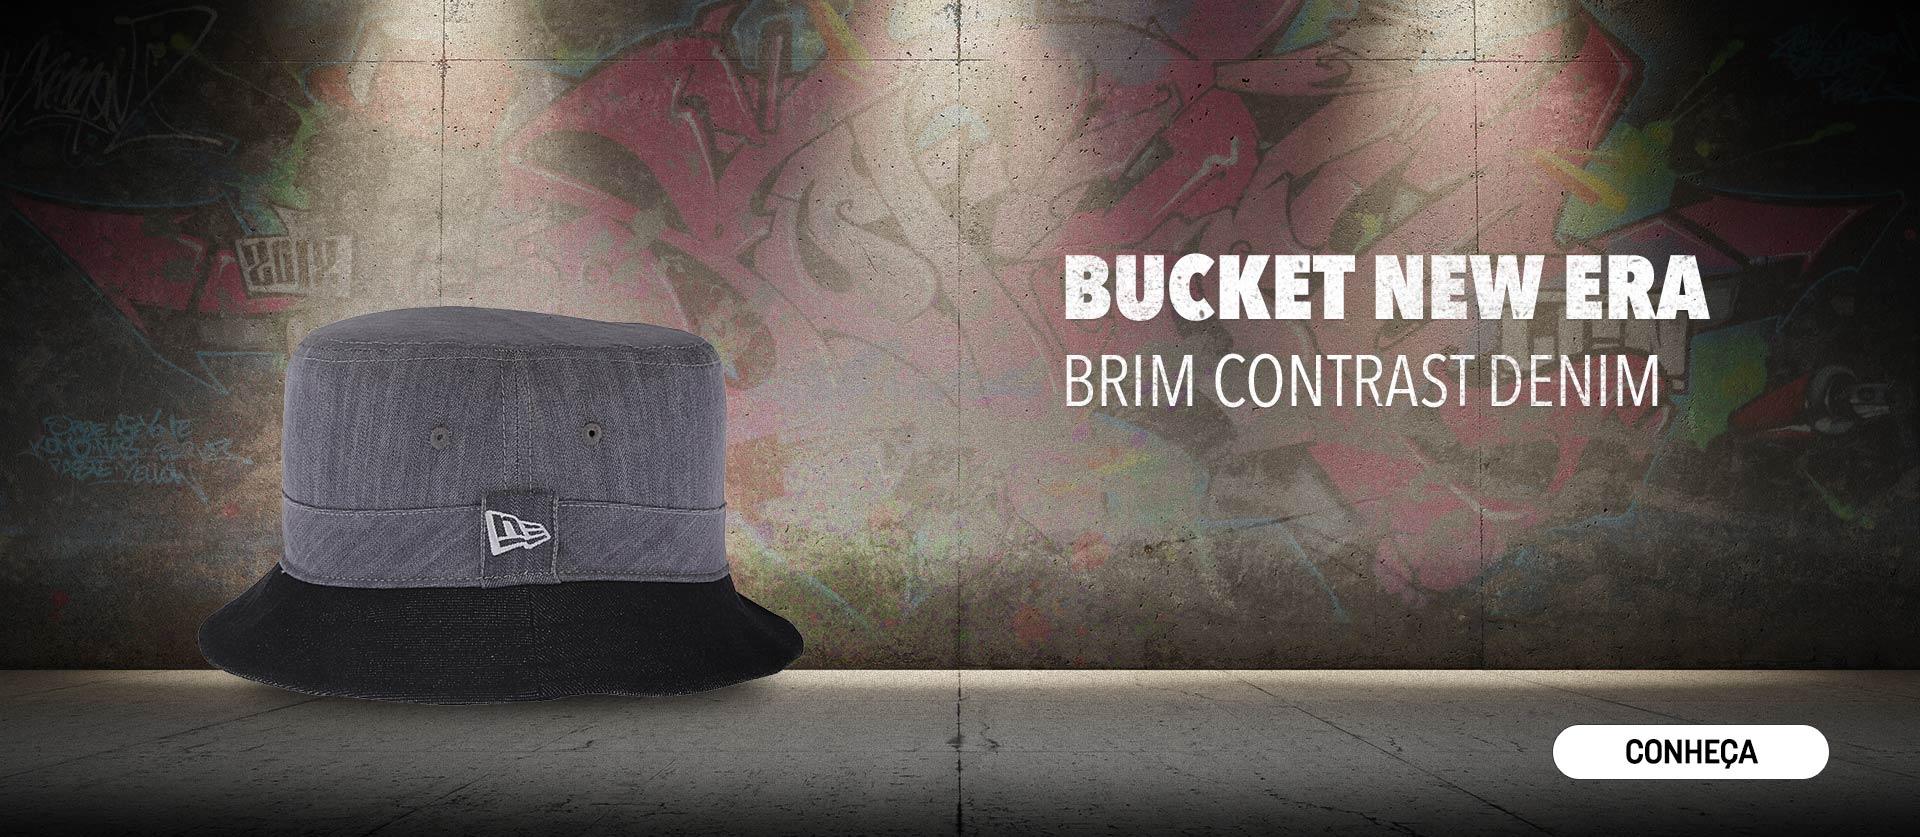 Bucket New Era Brim Contrast Denim